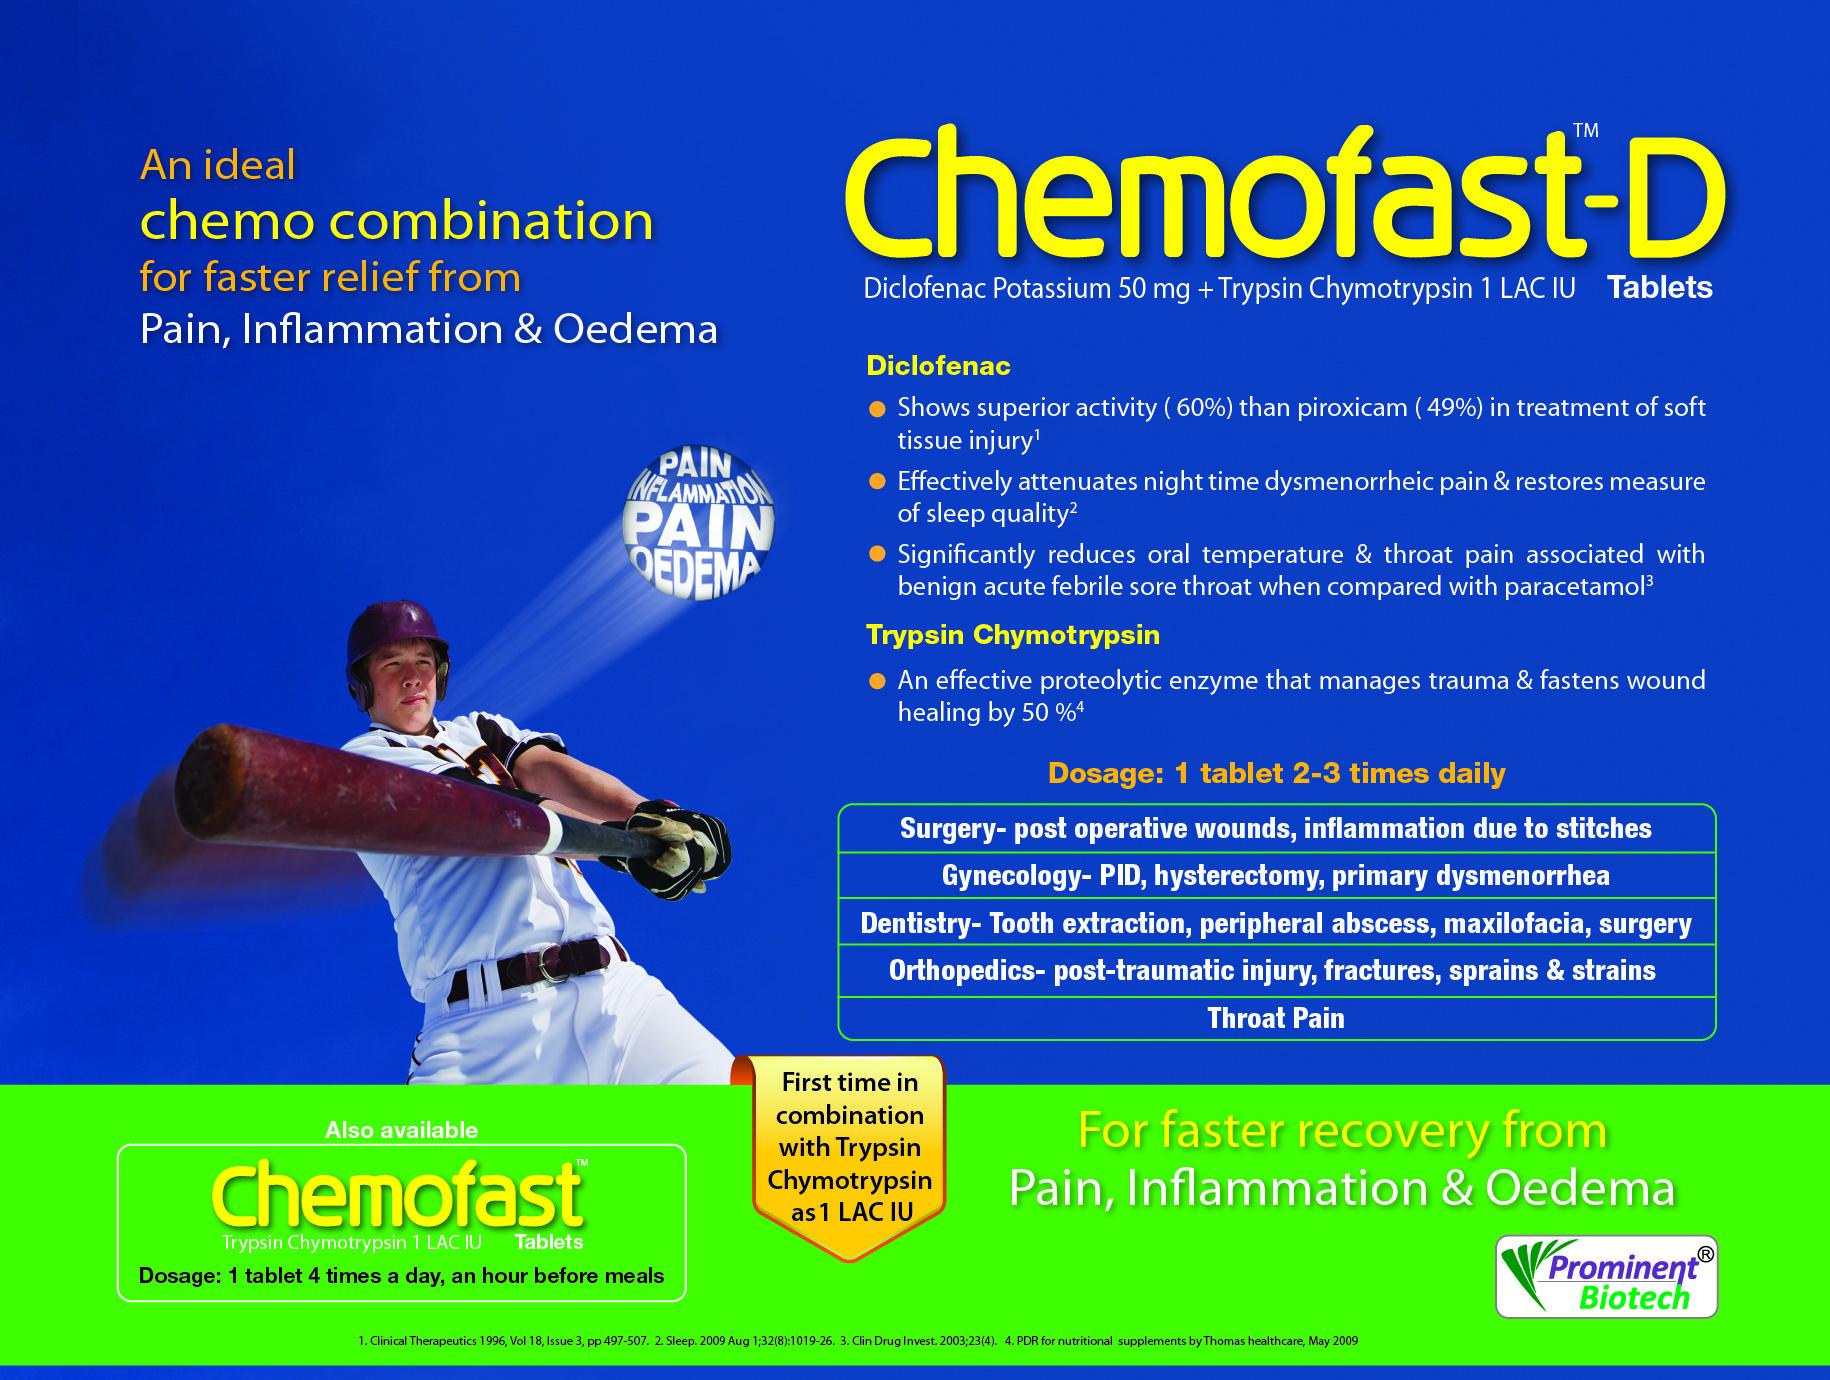 Trypsin-Chymotrypsin 1.00 lac I.U. & Diclofenac Potassium 50 mg